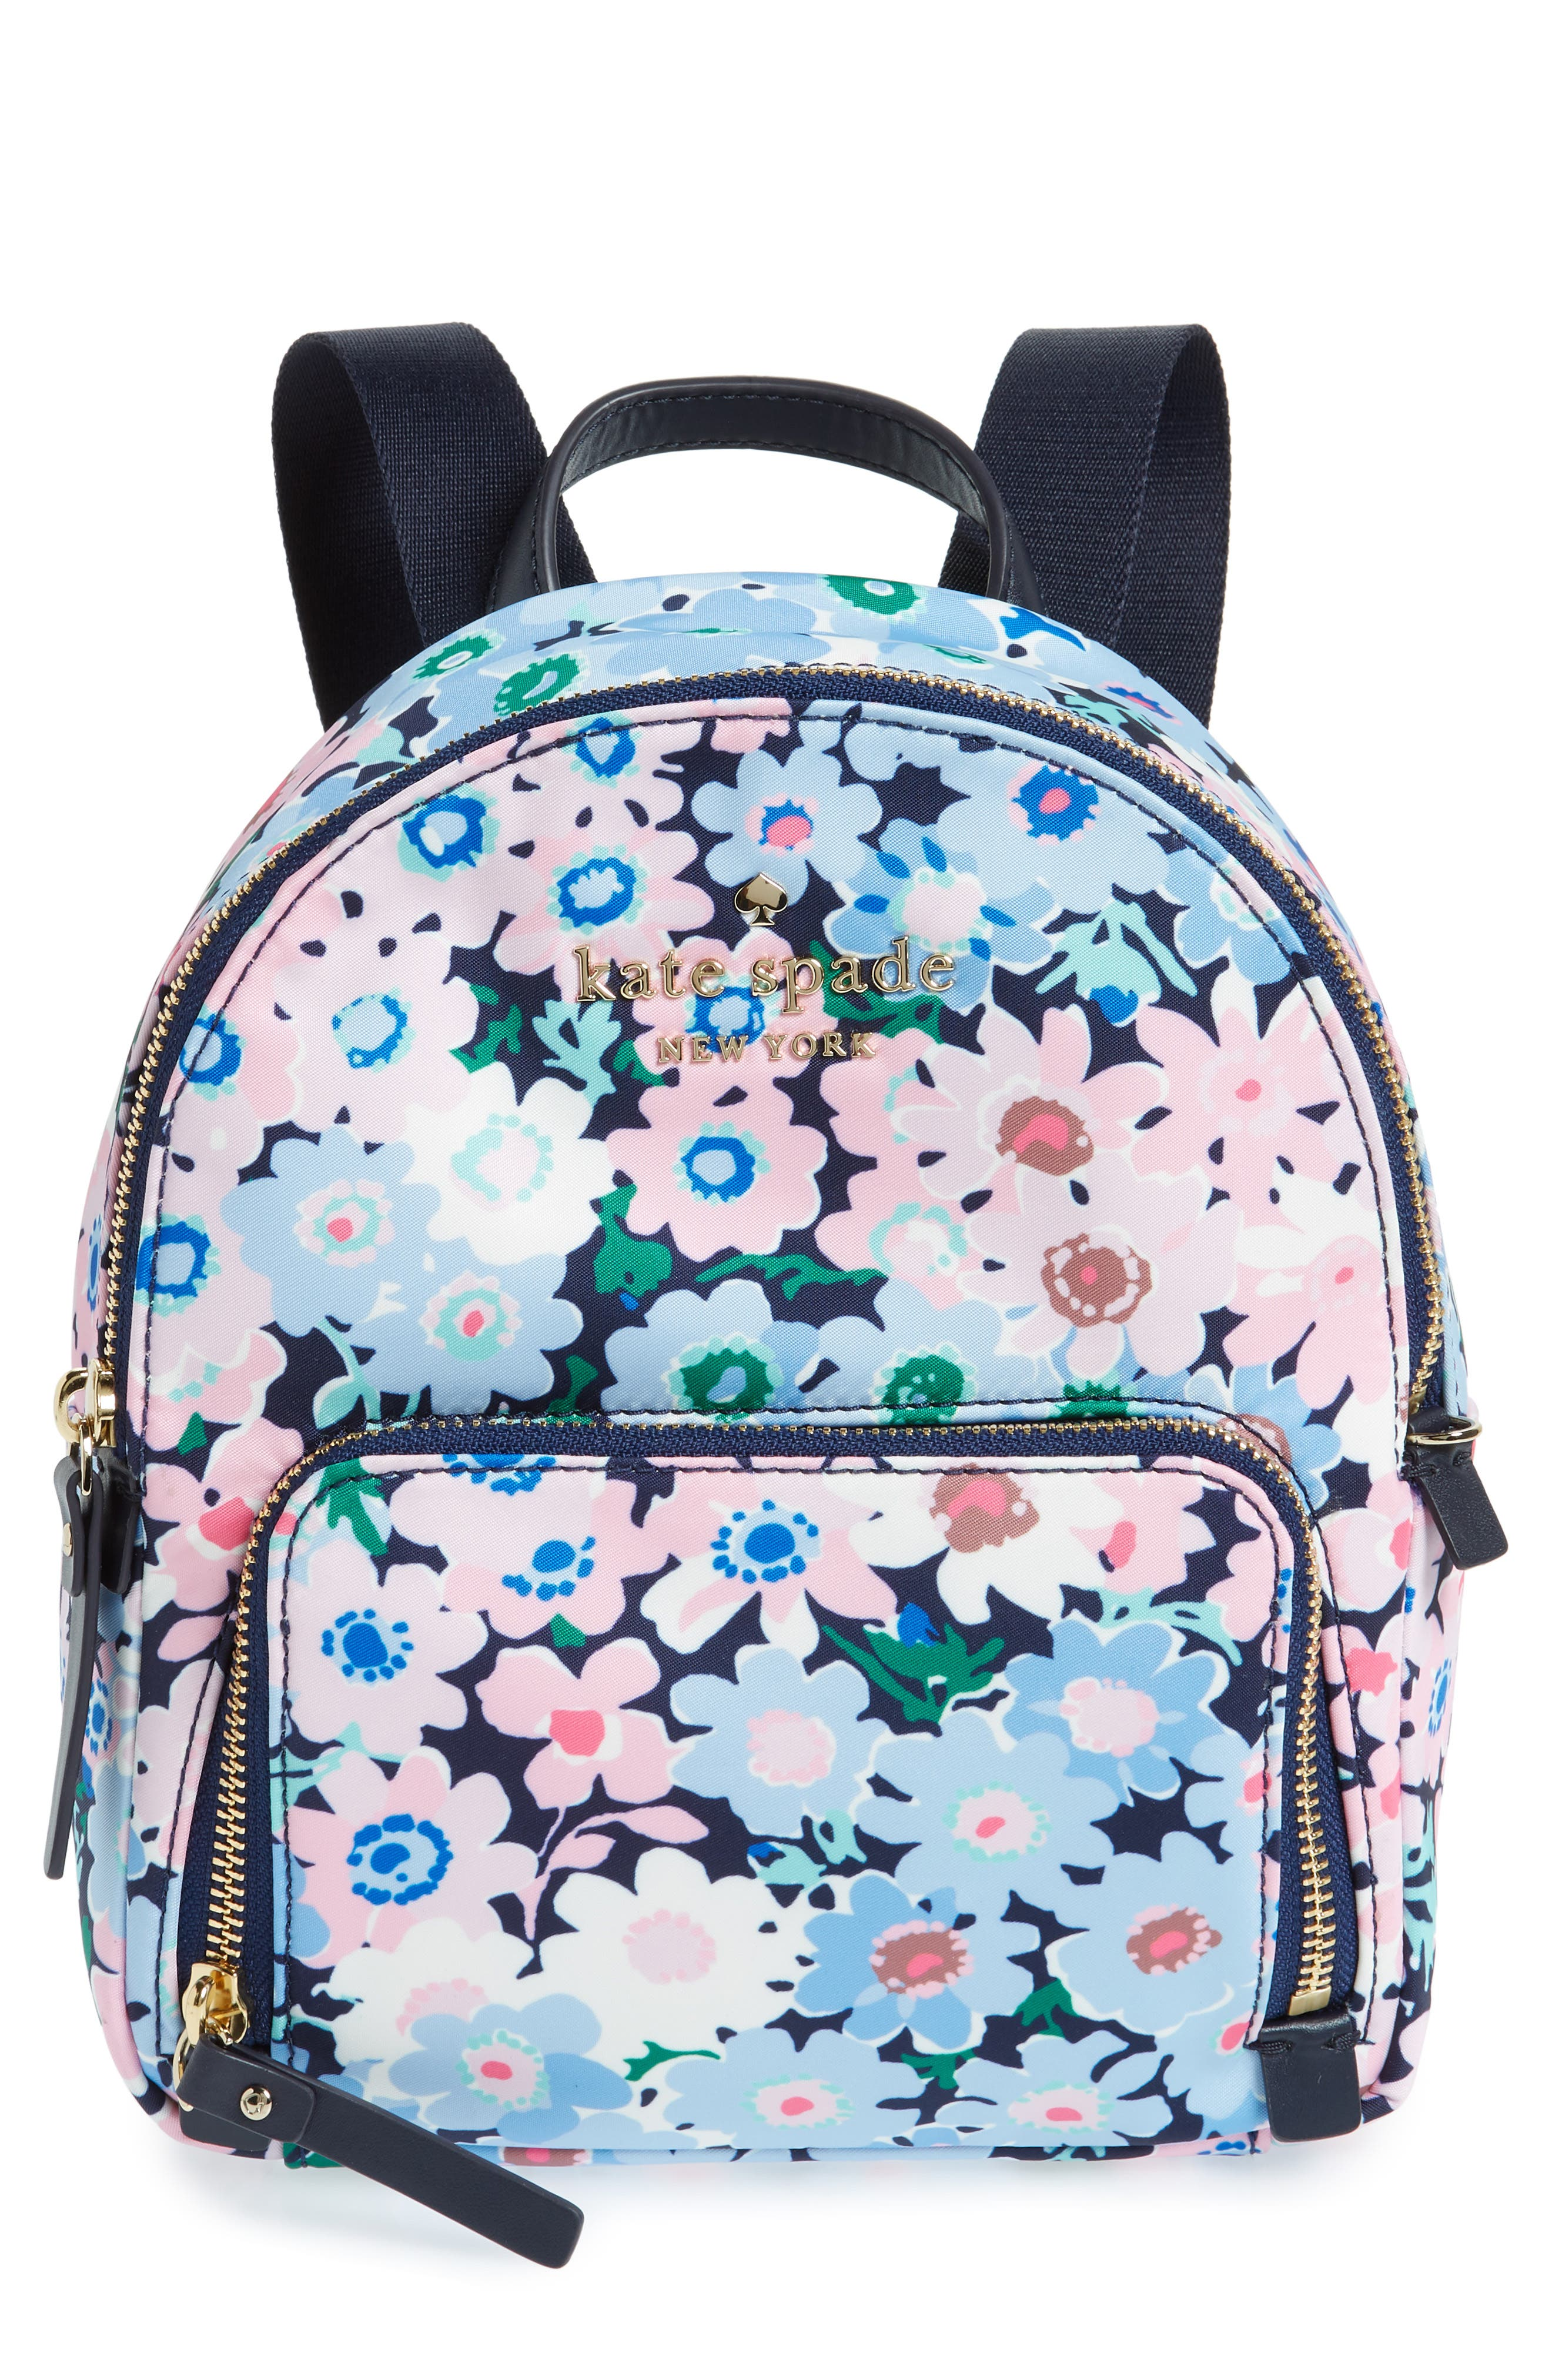 watson lane - daisy garden small hartley backpack,                             Main thumbnail 1, color,                             400